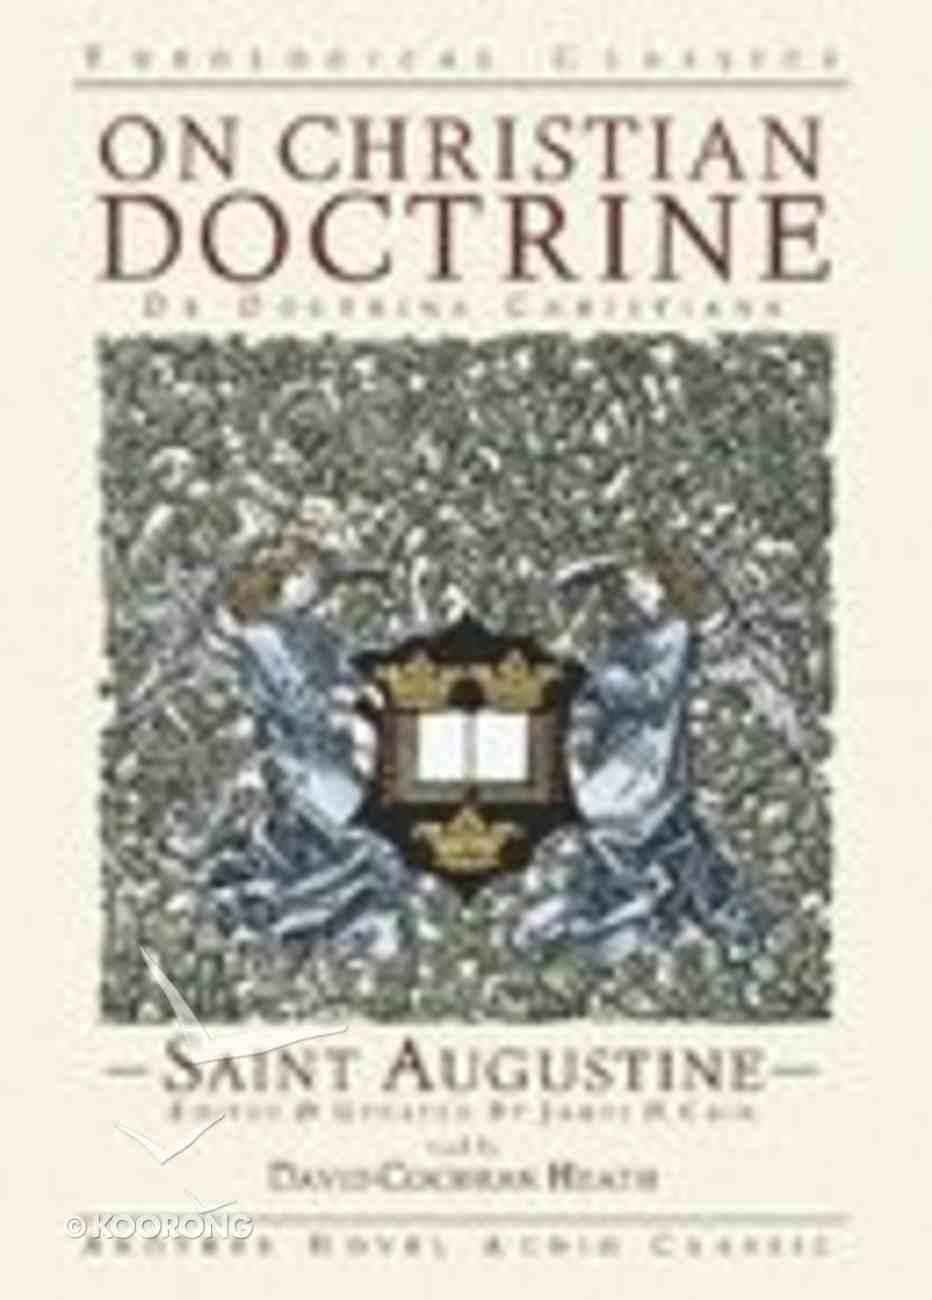 On Christian Doctrine CD